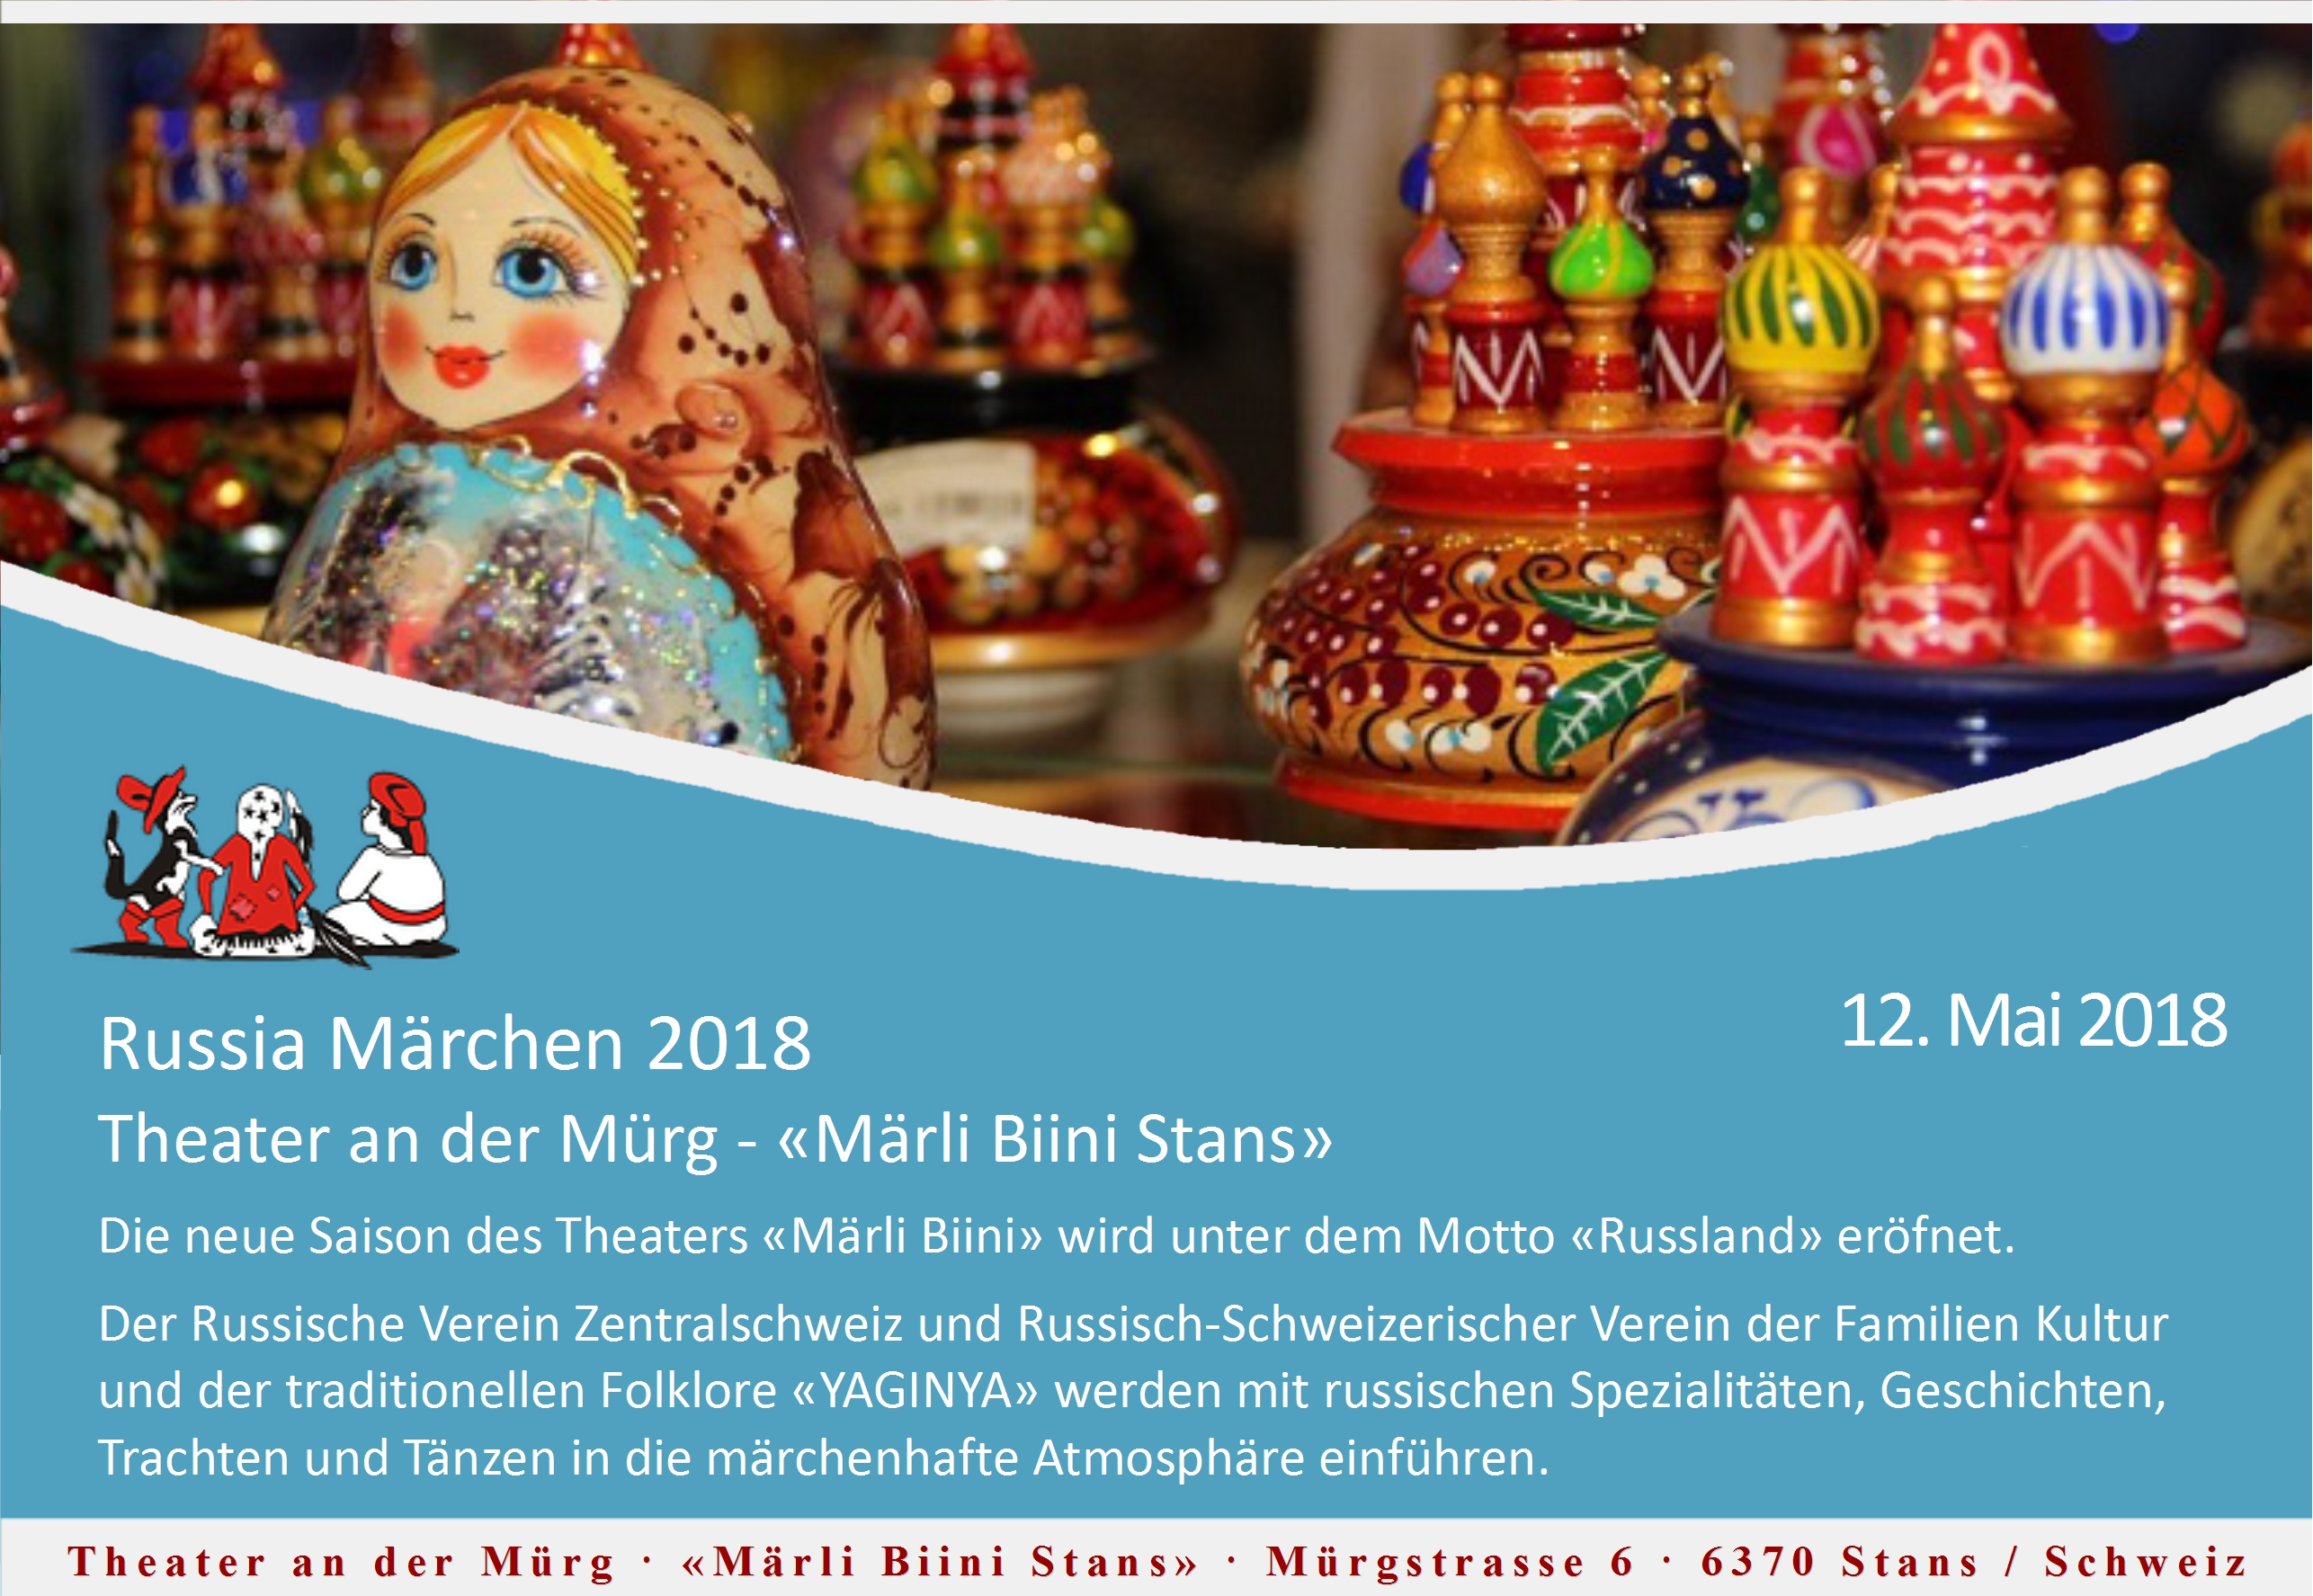 Theater_Stans_-_Märli_Biini_-_Russia_Märchen_2018